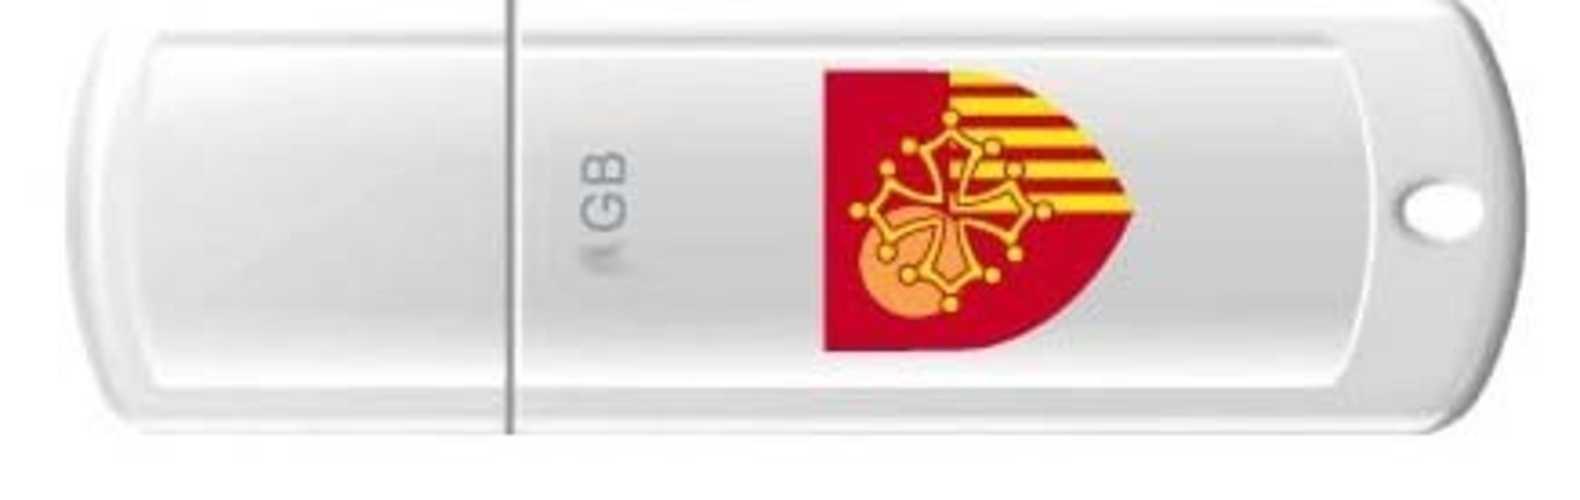 CLE USB 8 GO SERIE 370 BLANC USB 2.0 LOGO LANGUEDOC ROUSSILLON 0